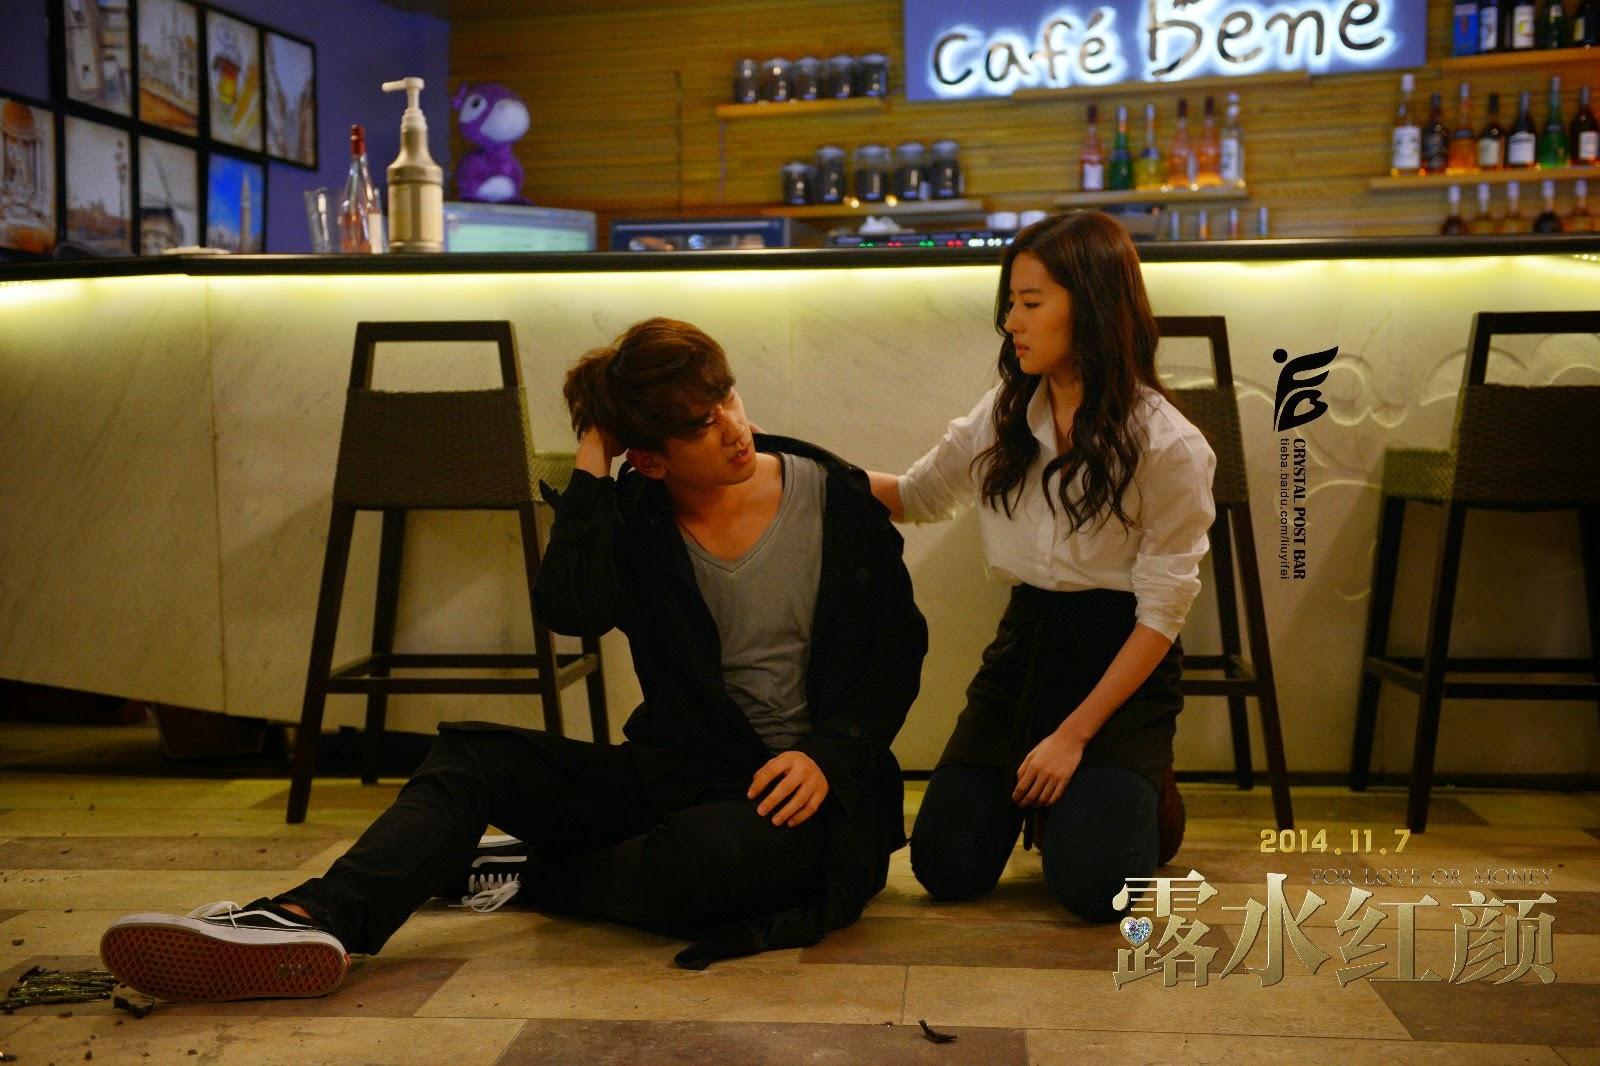 Rain 中国映画 露水紅顔_c0047605_8111582.jpg